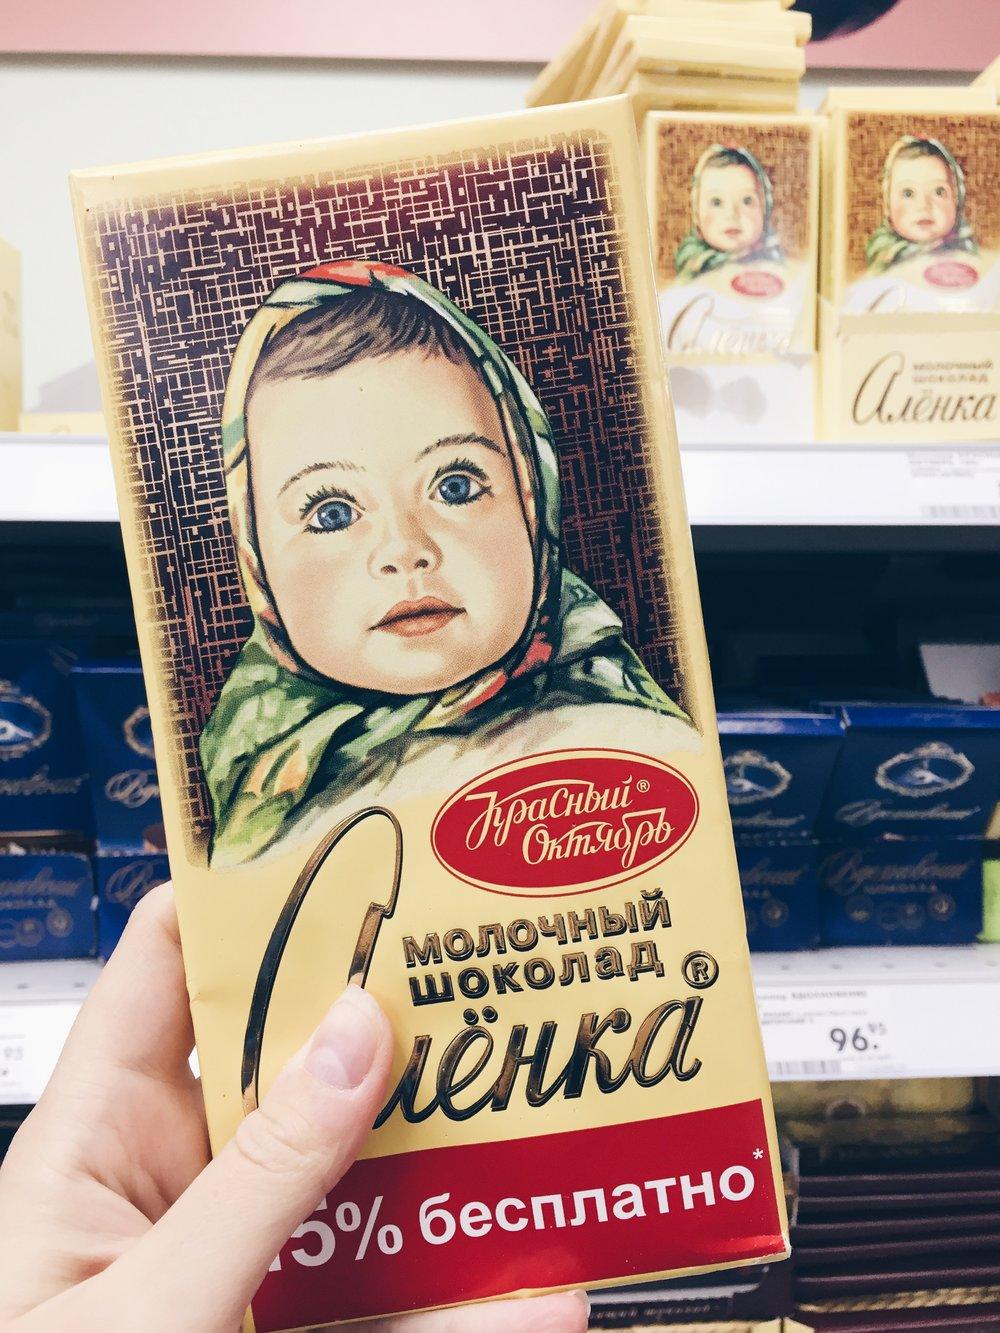 My favorite Russian milk chocolate.